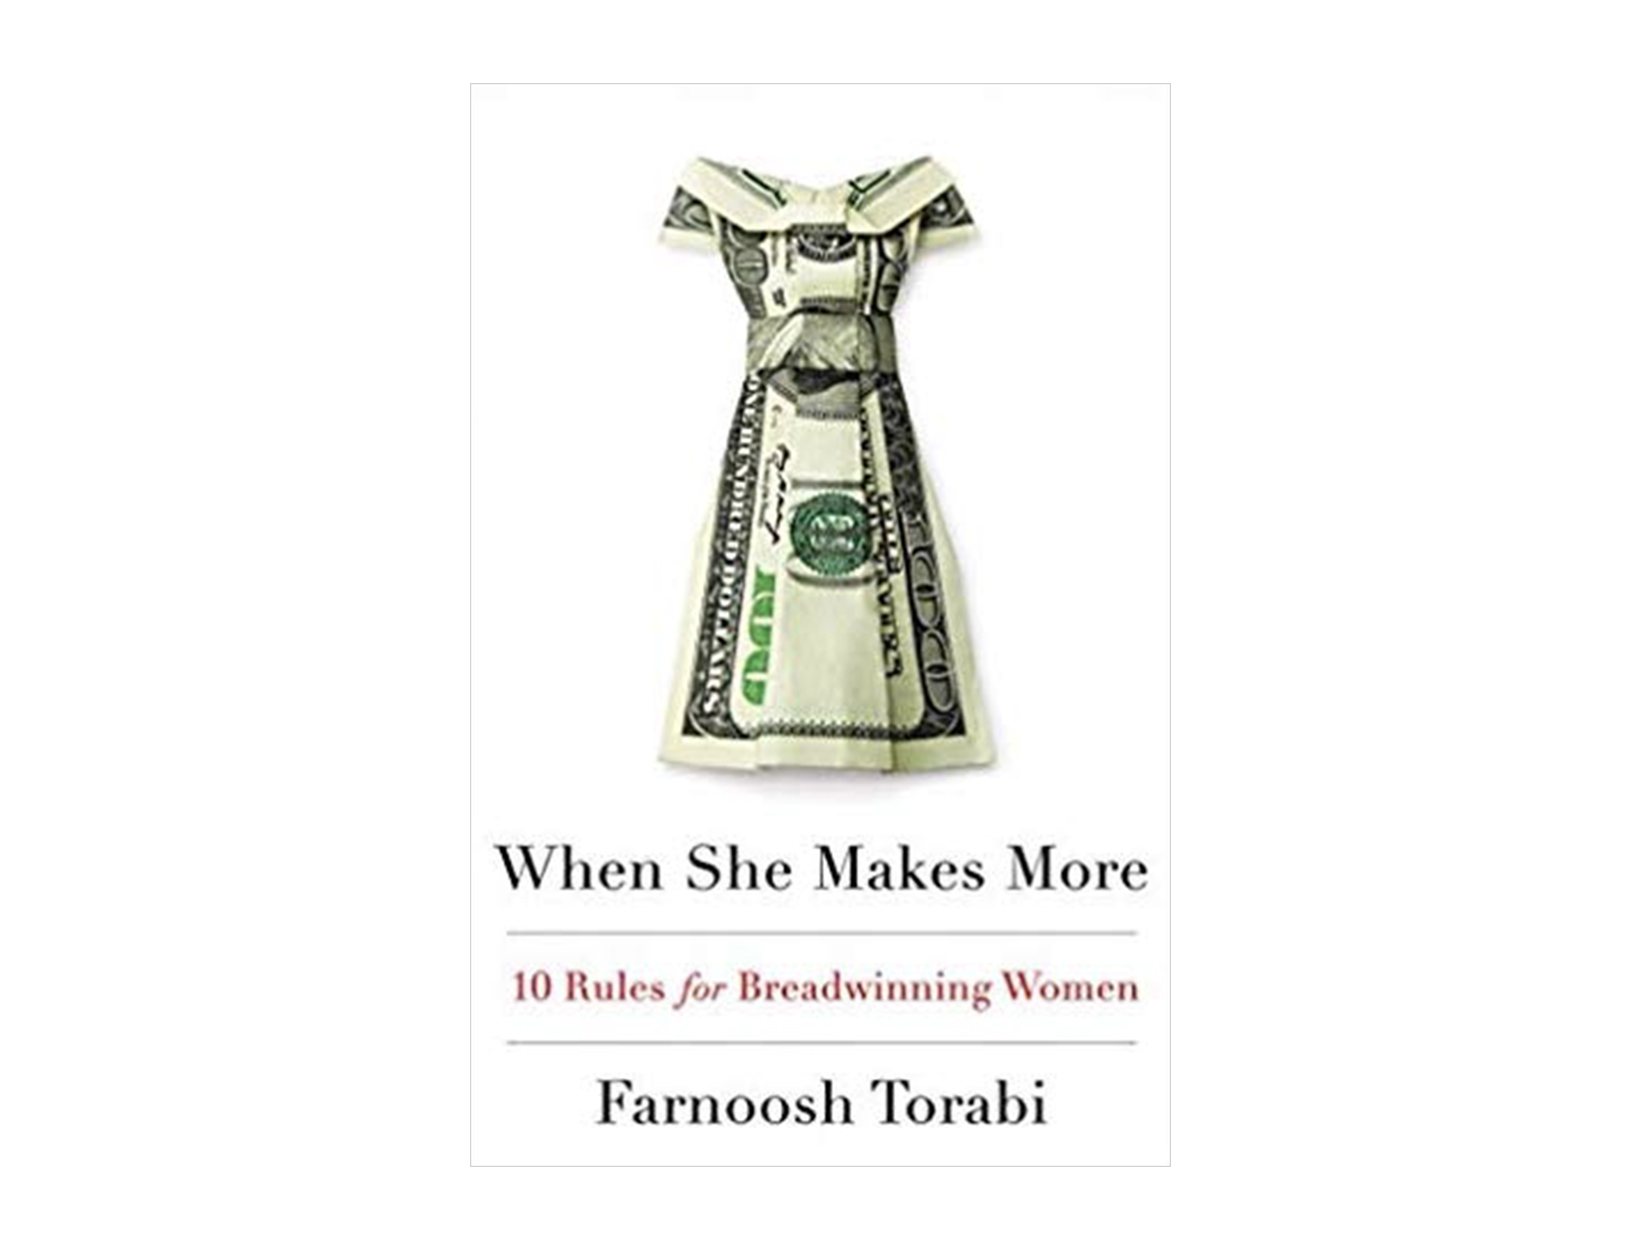 <em>When She Makes More</em> by Farnoosh Torabi